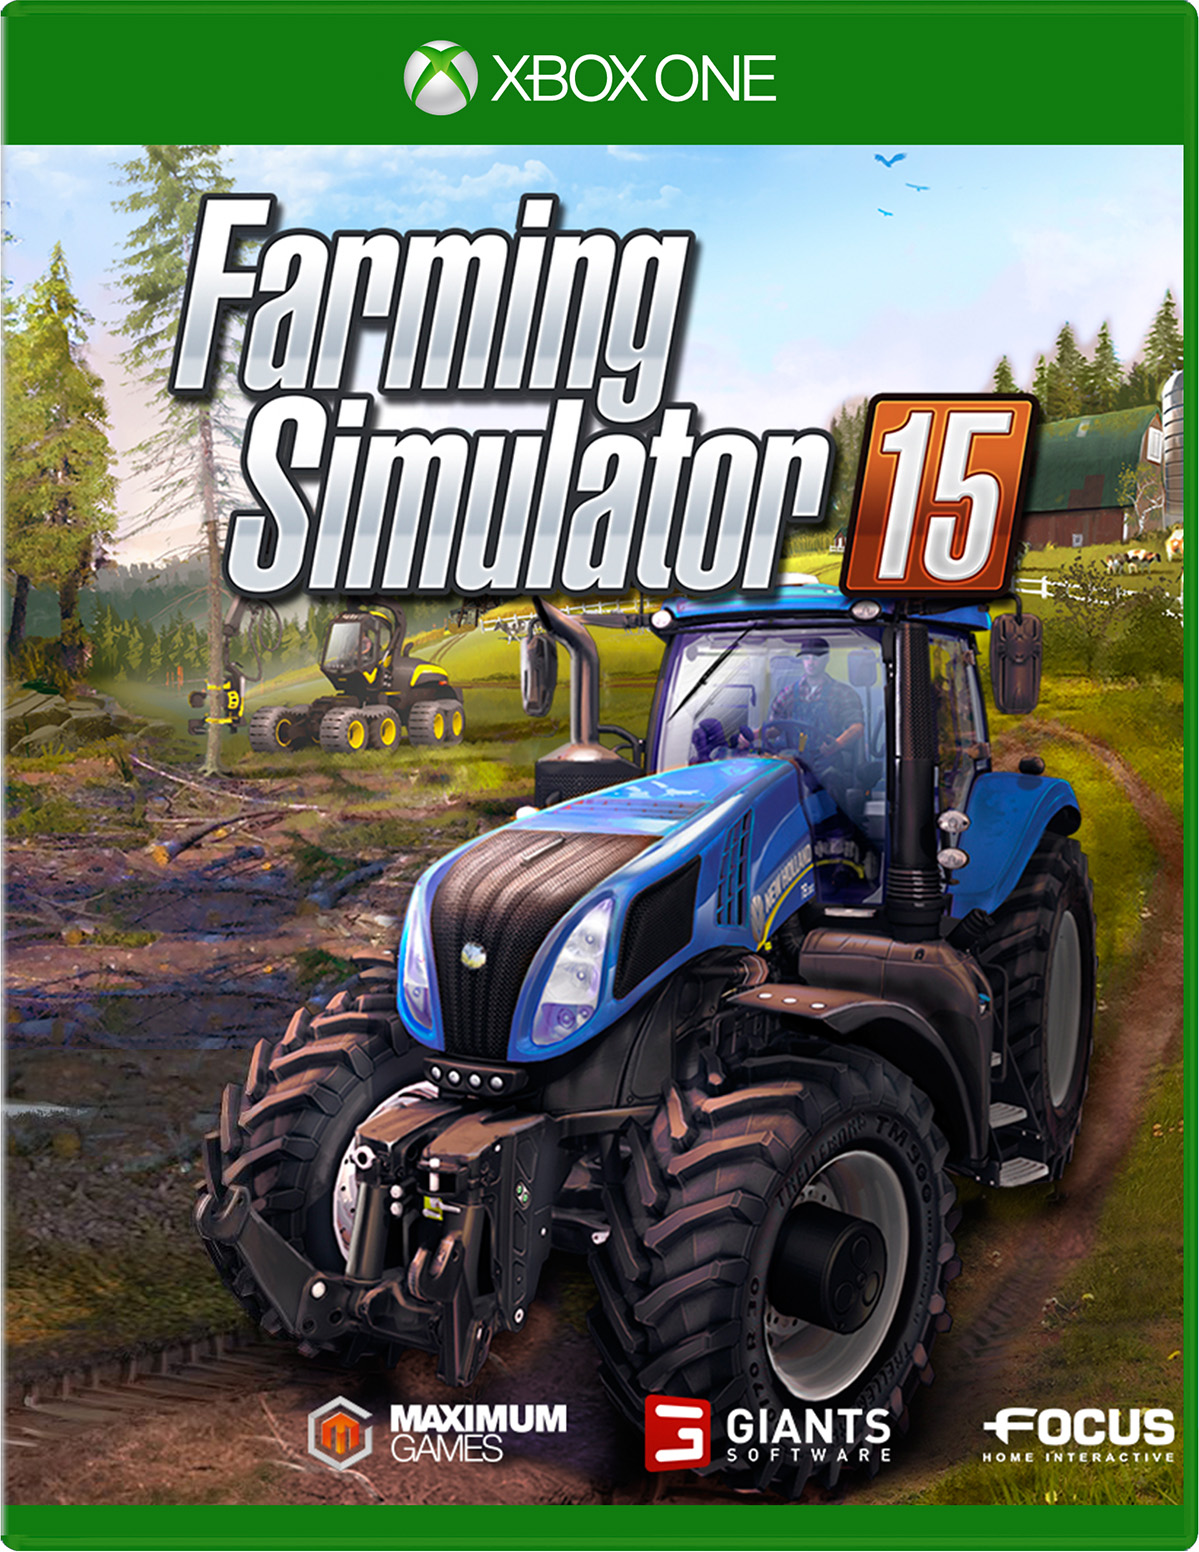 Farming Simulator 15 for Xbox One